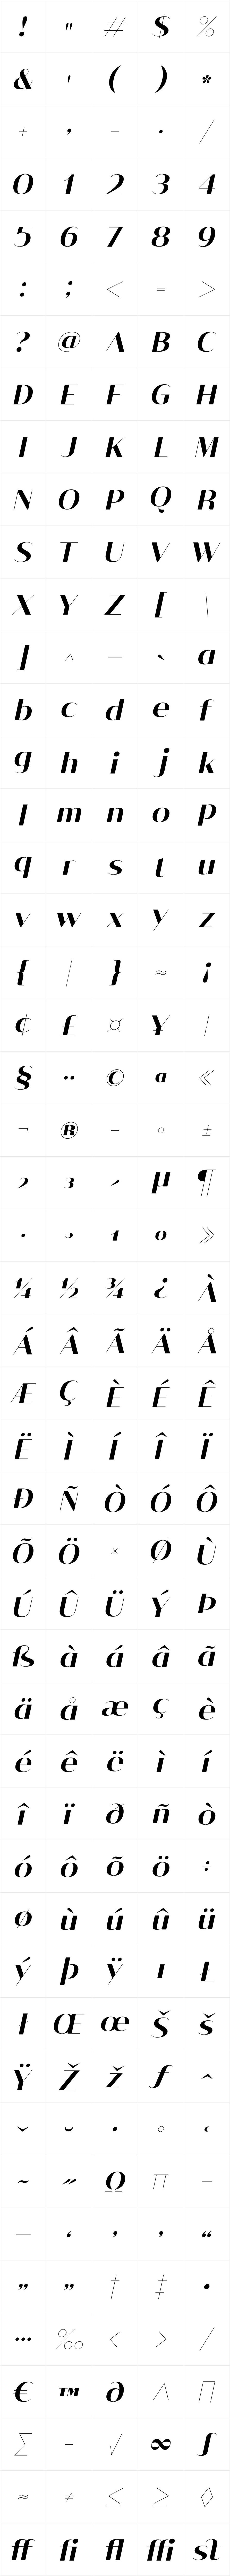 Vage Italic